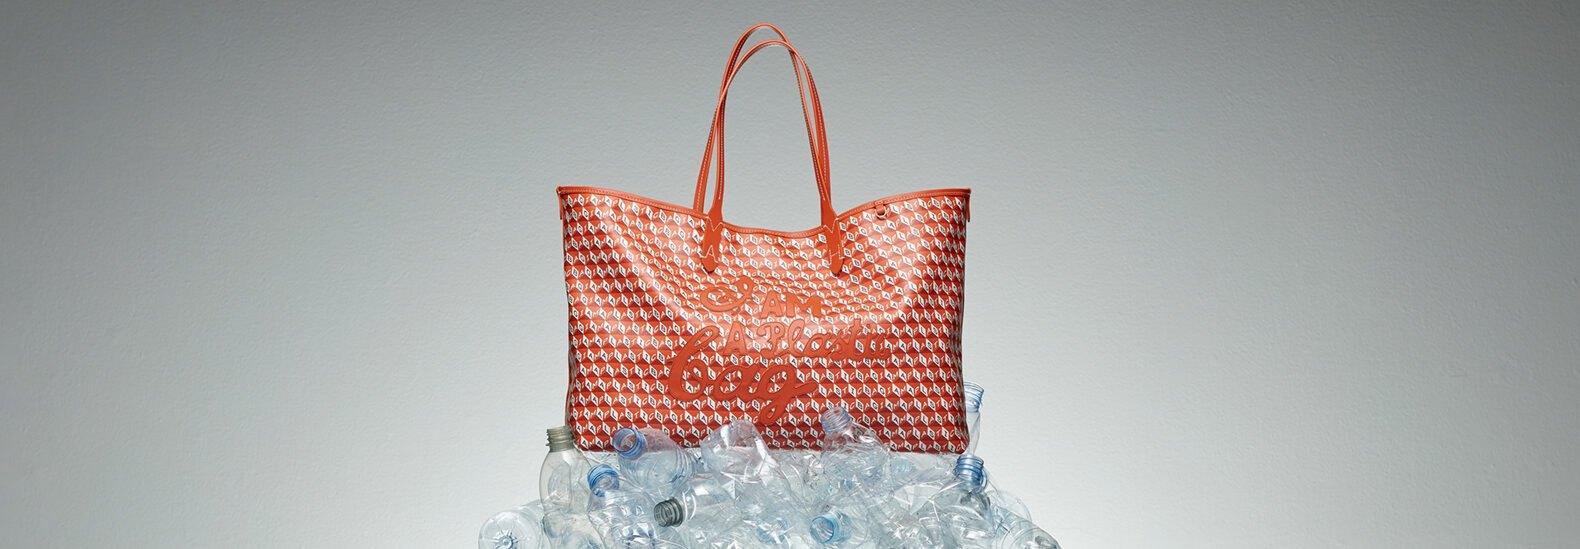 Sebuah tas yang diproduksi berbahan dasar botol plastik yang didaur ulang keluaran Inhabitat. Dimasa depan, daur ulang botol plastik tak hanya dalam bentuk barang, namun juga dalam bentuk rasa vanilla pada makanan dan minuman. (photo: dok. Inhabitat)